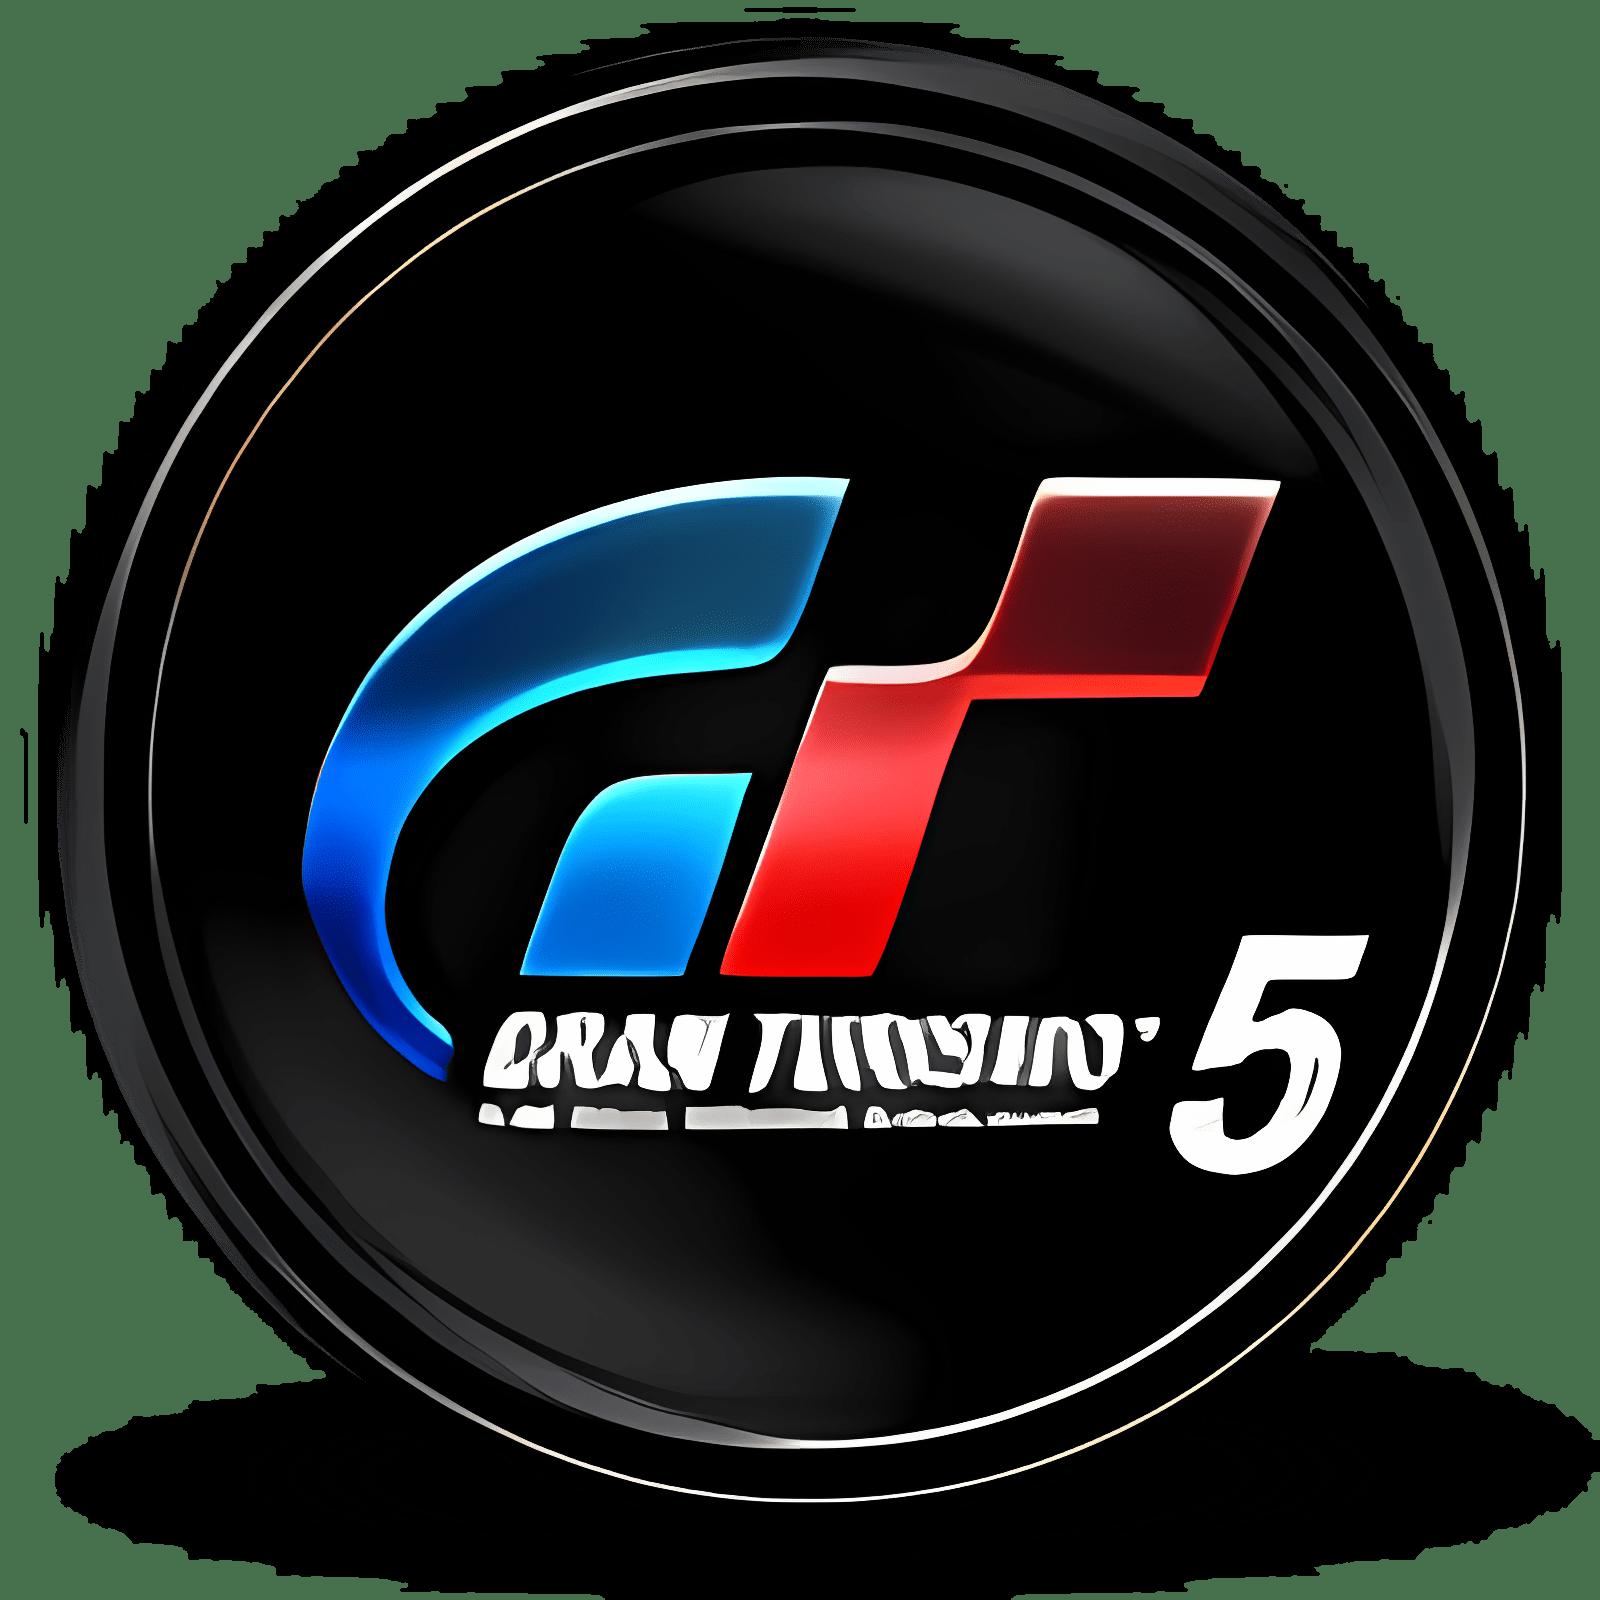 Tapeta Gran Turismo 5